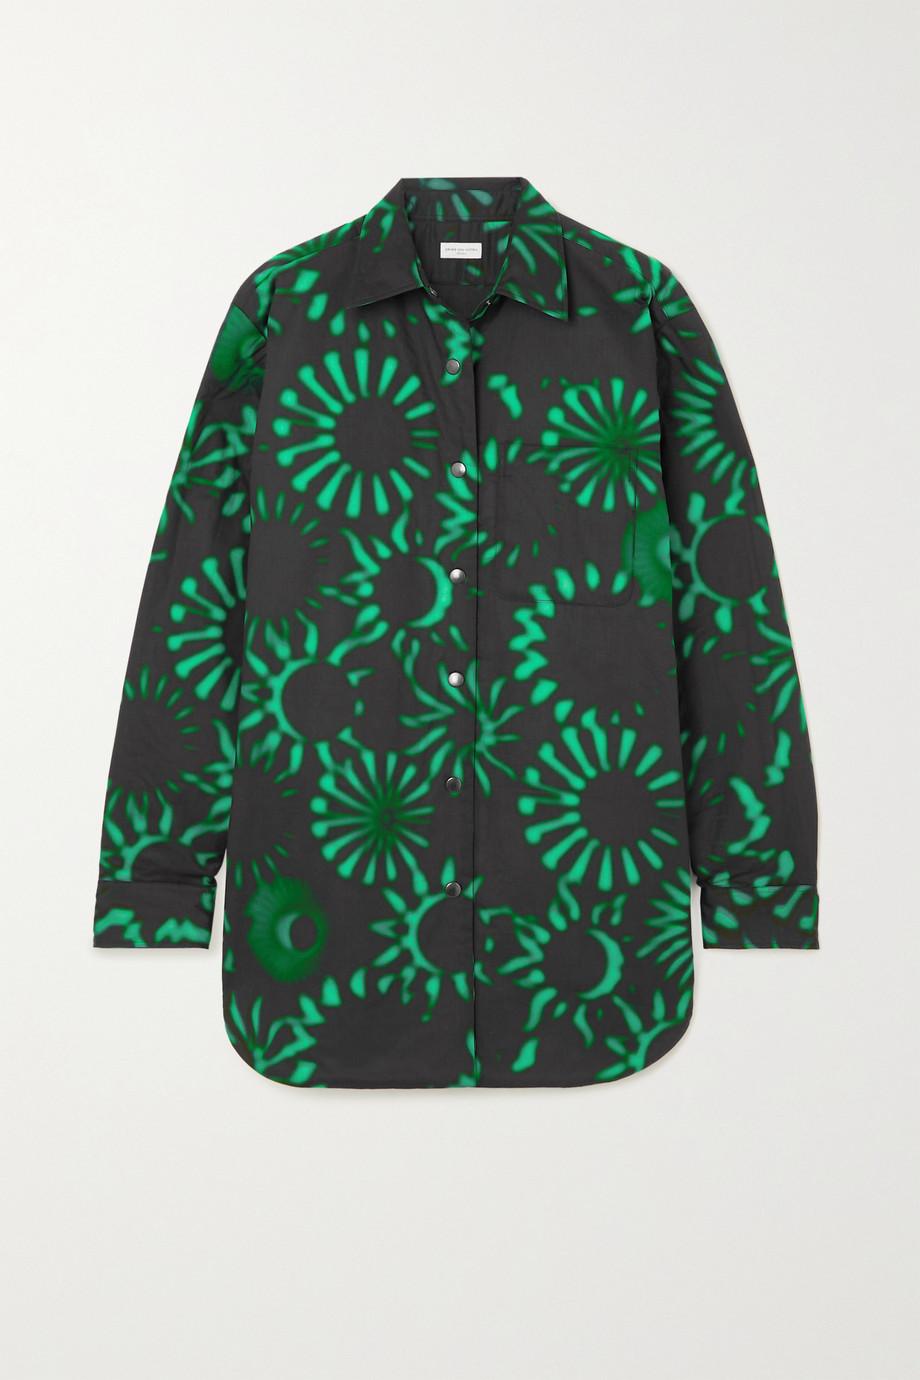 Dries Van Noten Carnella oversized printed cotton jacket